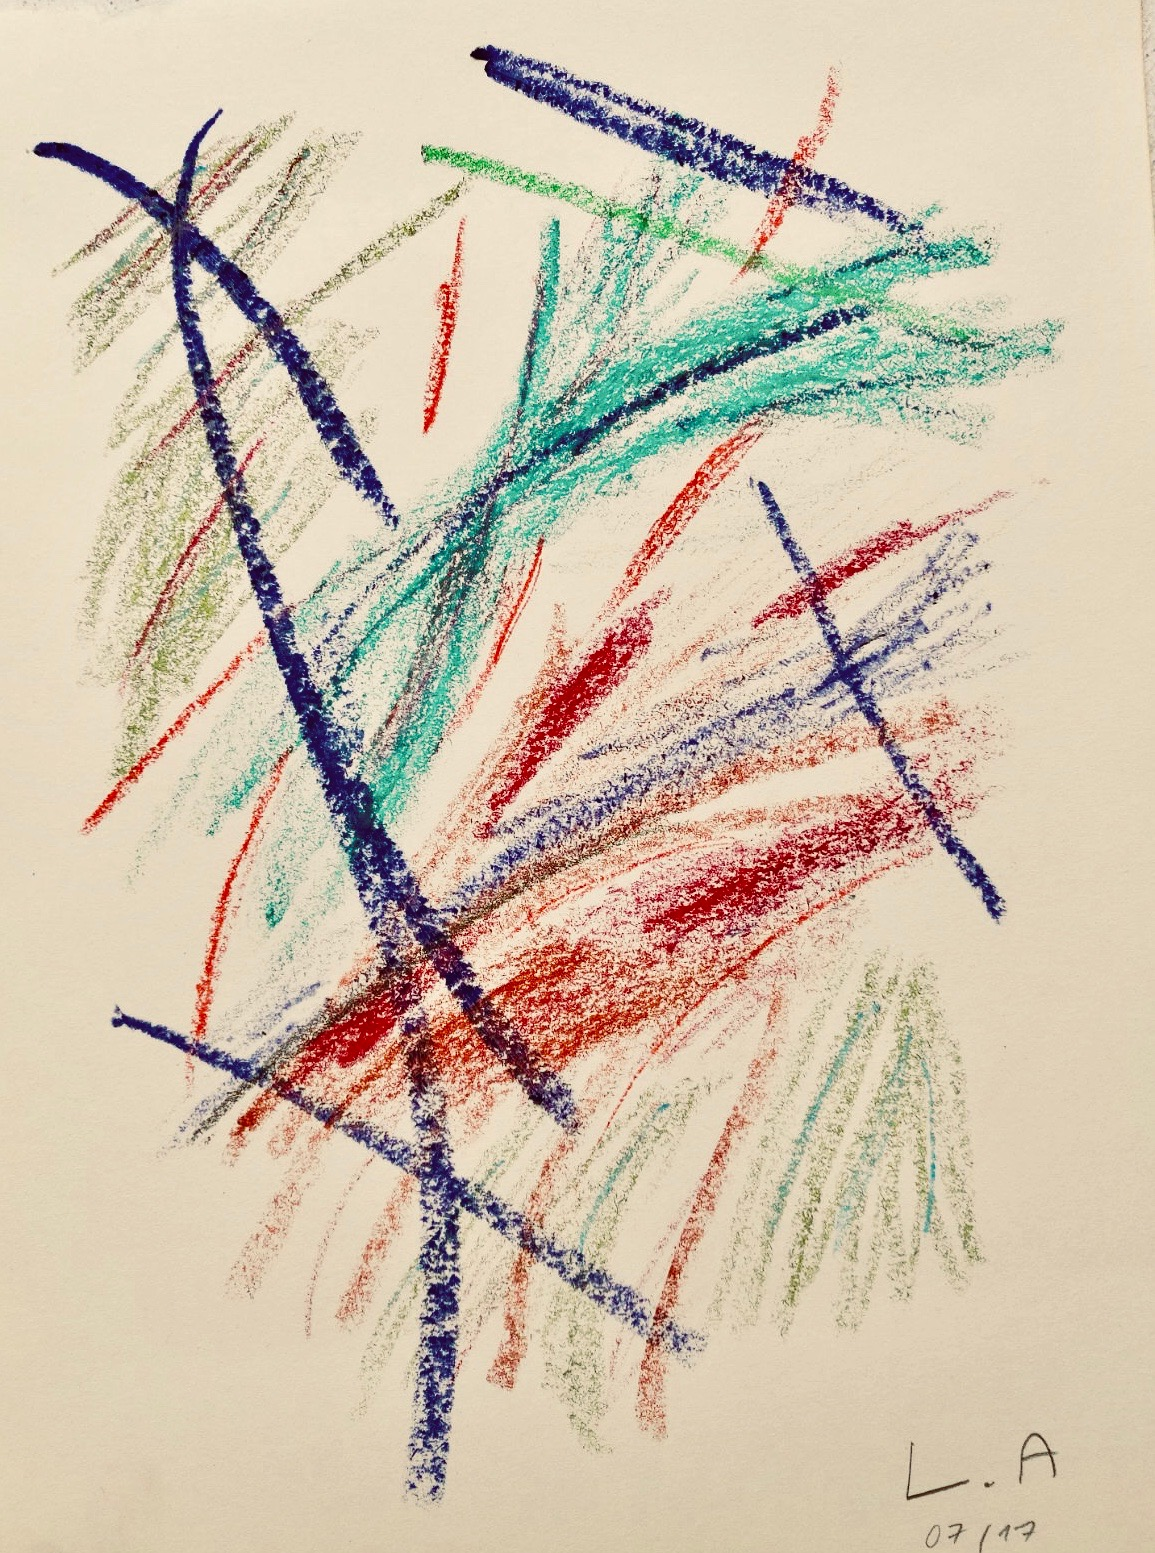 Atelier Arts visuels: interventions de Pedro Escobar Uribe et Carmen Chazzin